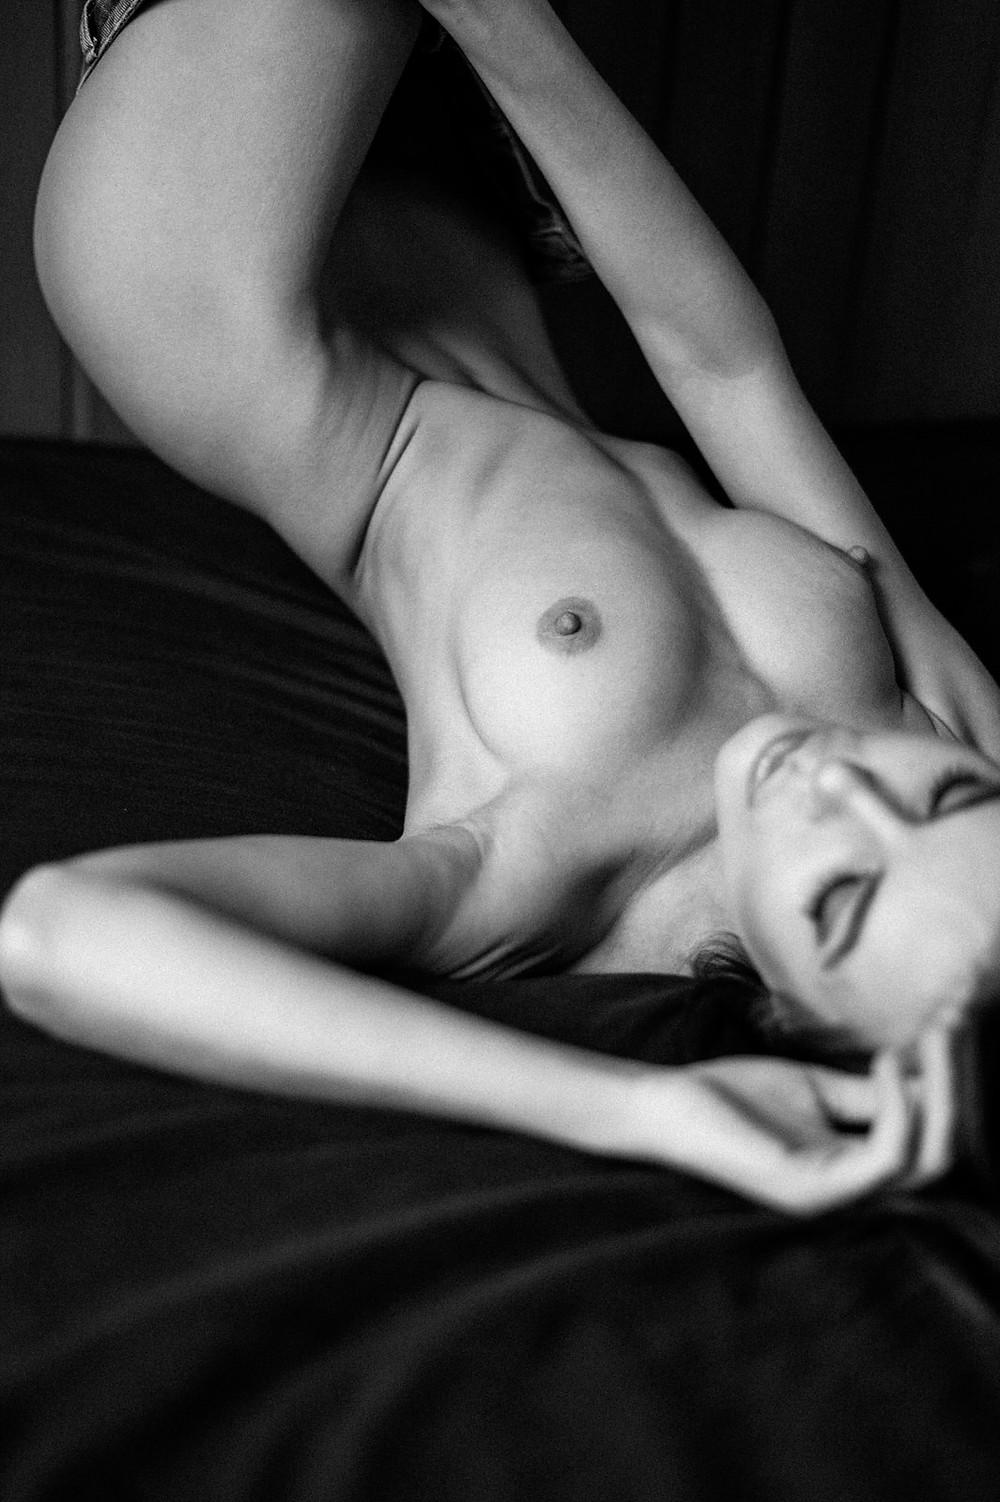 nude art - glamour - naked - photo shooting - nude photography - akt fotografie köln - teilakt köln - playboy bunny - fotograf köln